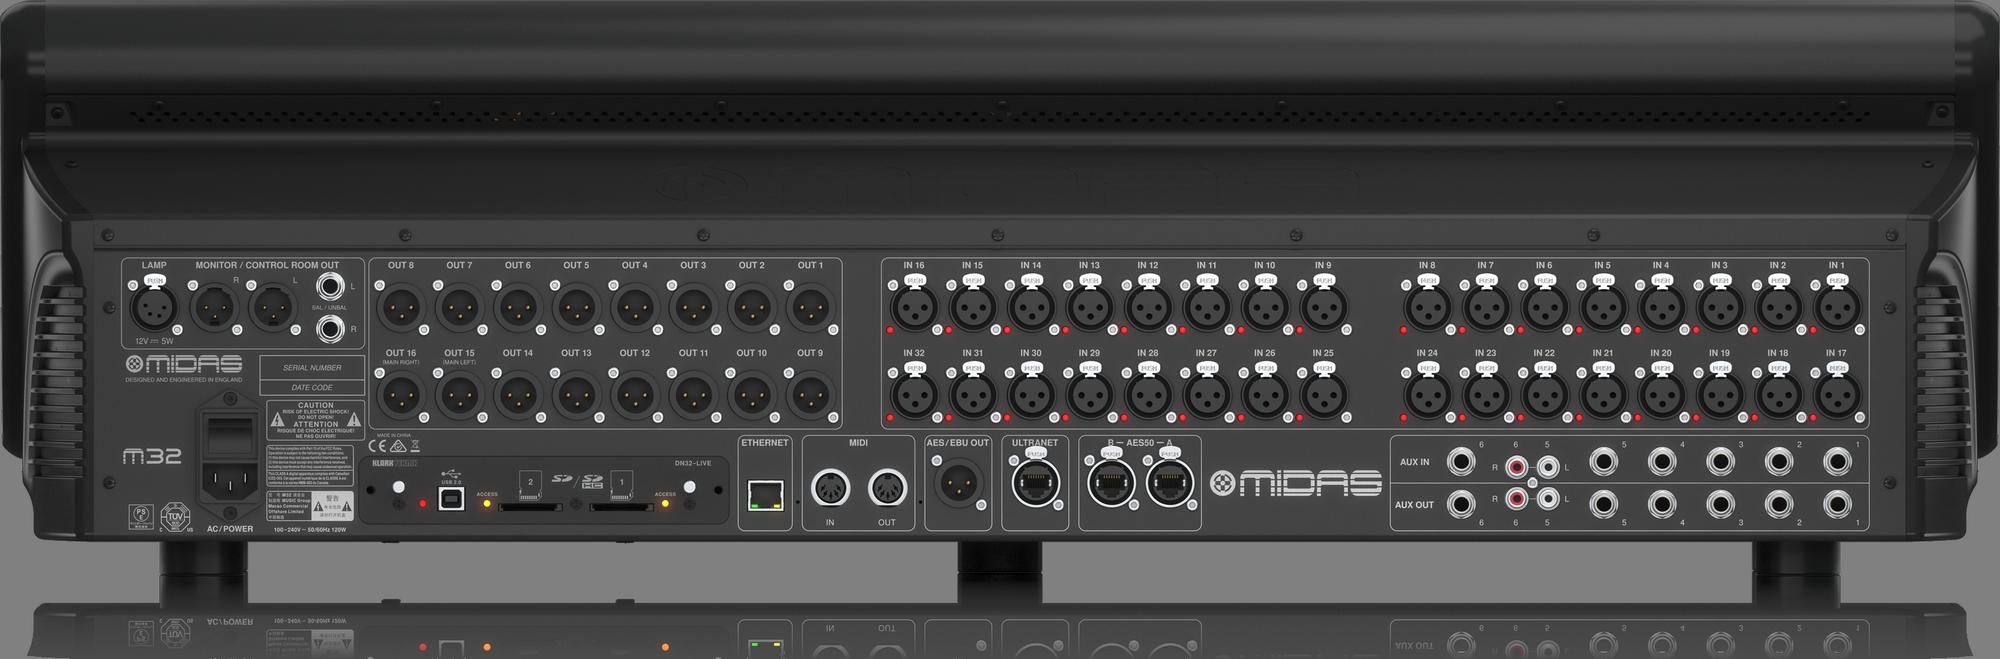 Midas M32 Live + DL32 Combi - Console with stageblock